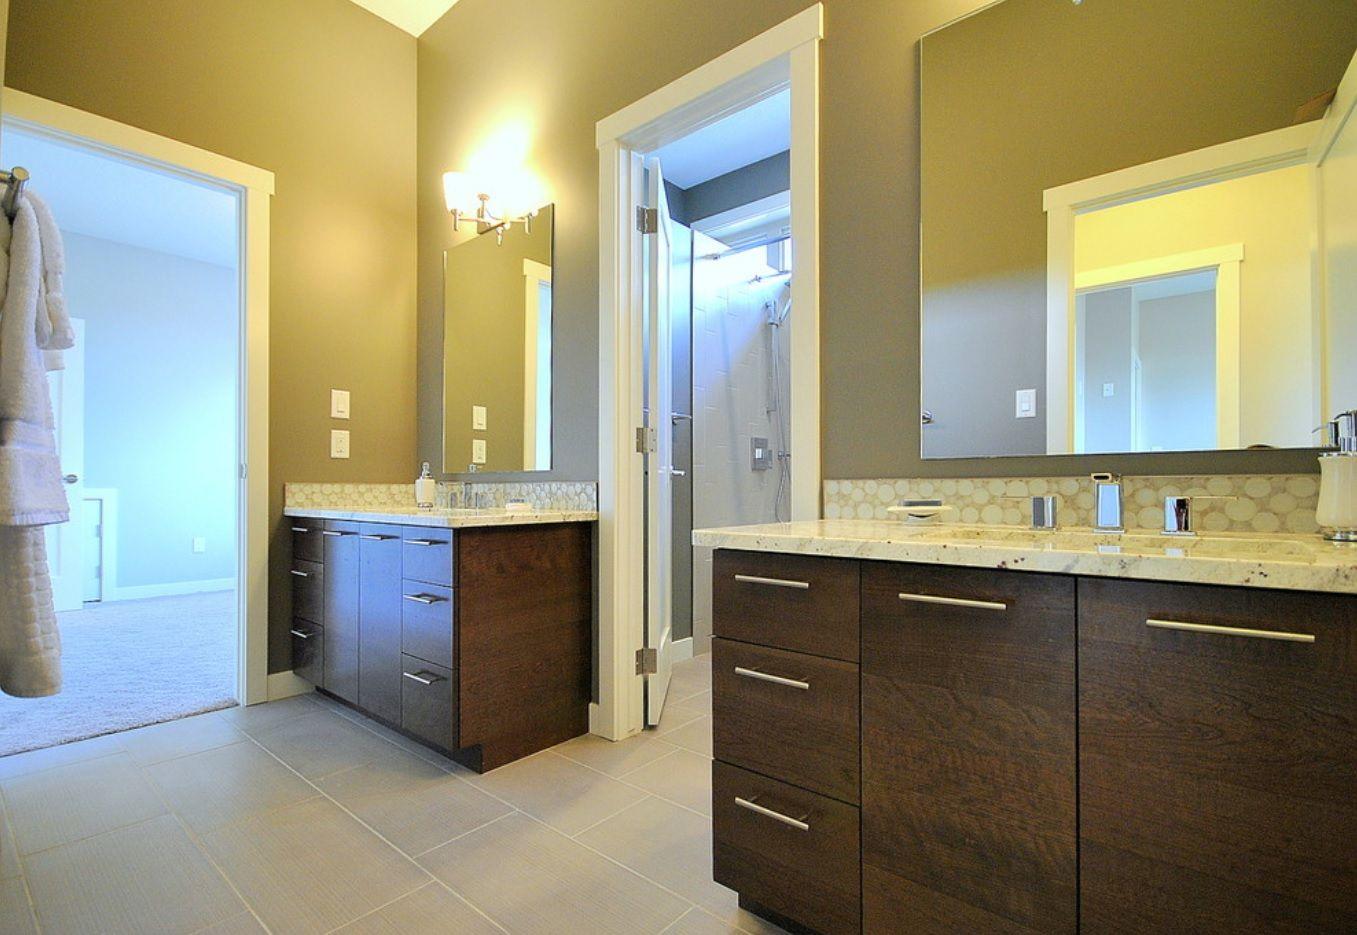 Jack and Jill Bathroom Interior Design Ideas - Small Design Ideas